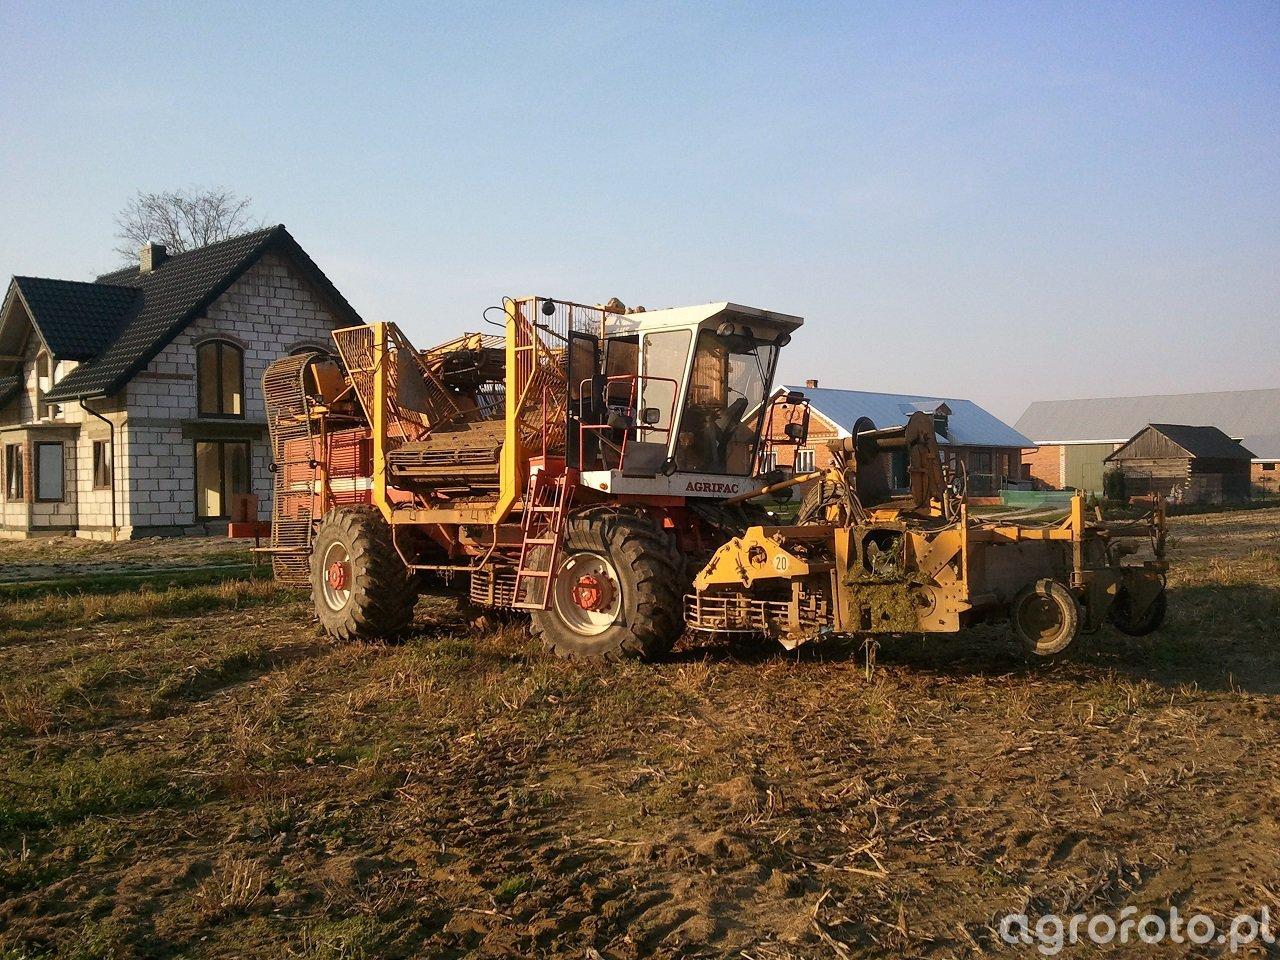 Agrifac ZA 215 EH